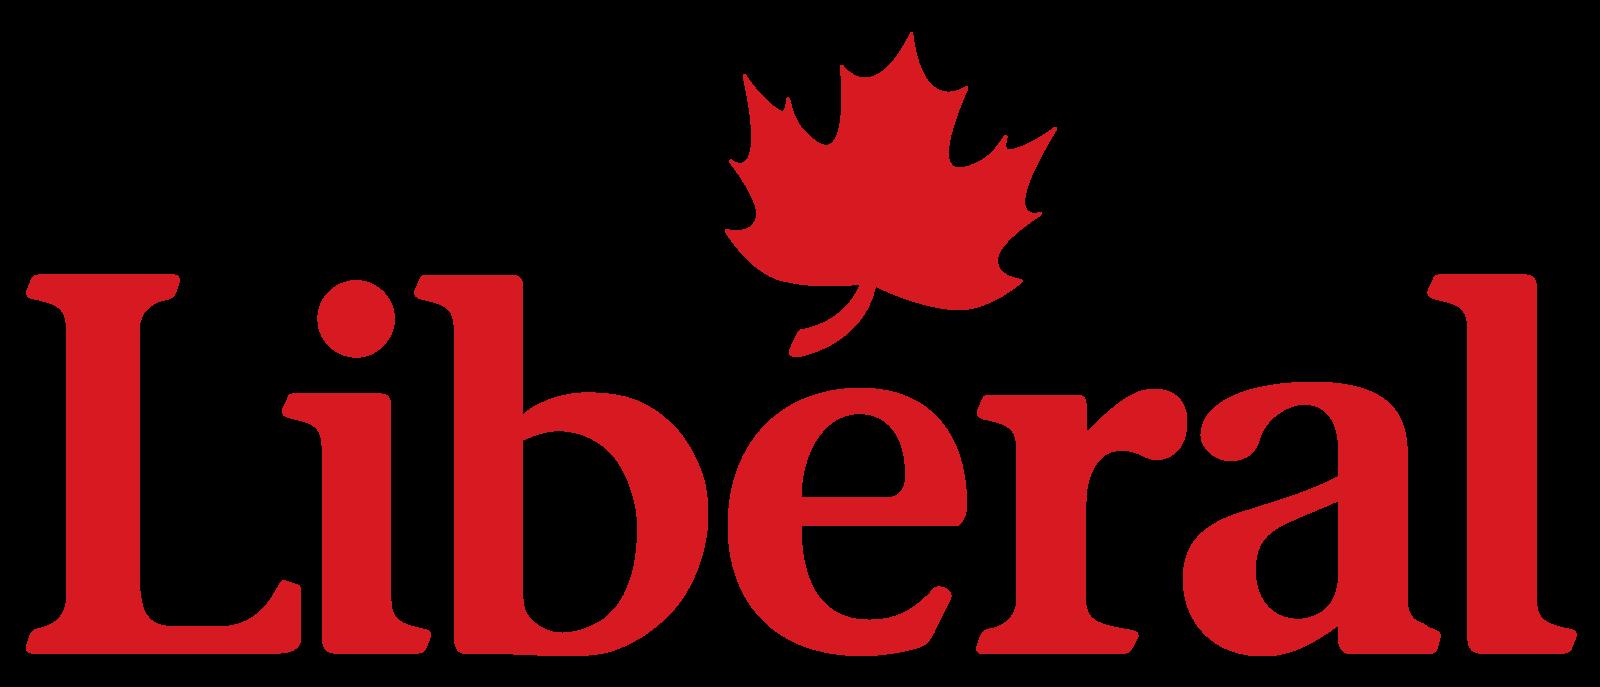 Politics clipart party caucus. Logos graphics